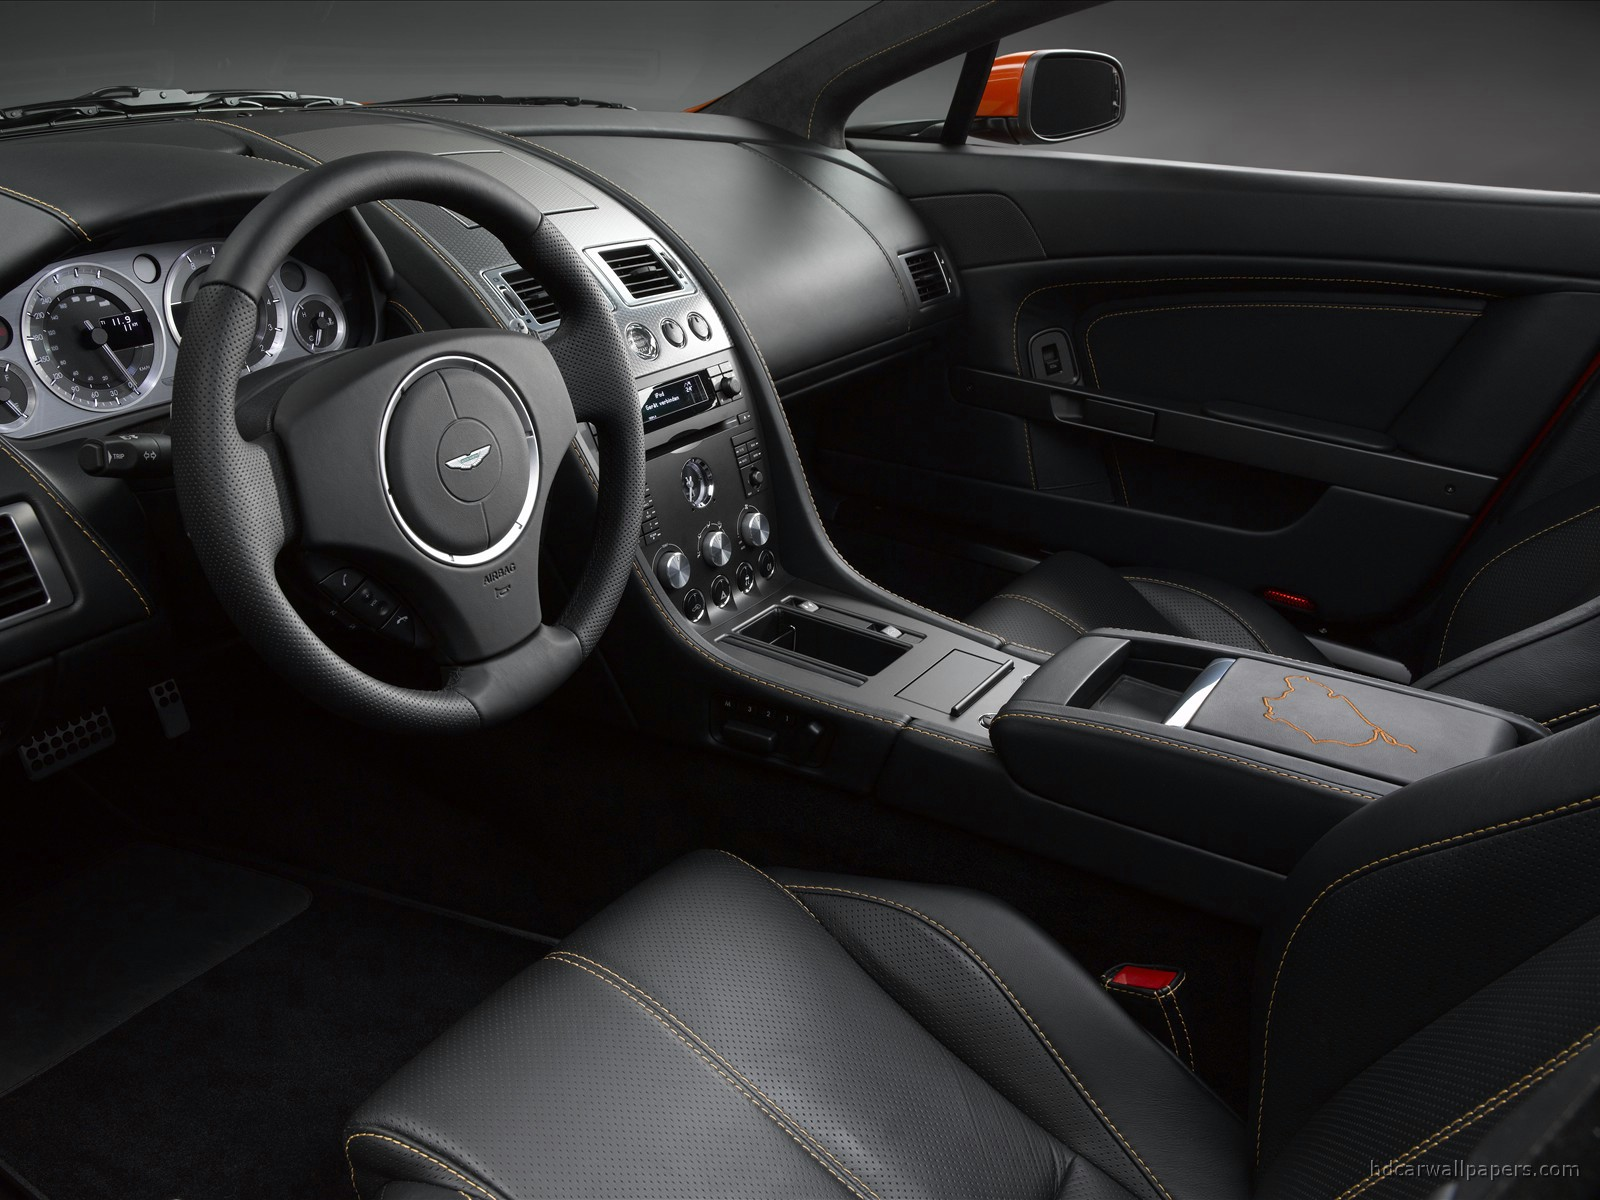 Aston Martin V8 Vantage N400 Interior Wallpaper Hd Car Wallpapers Id 23